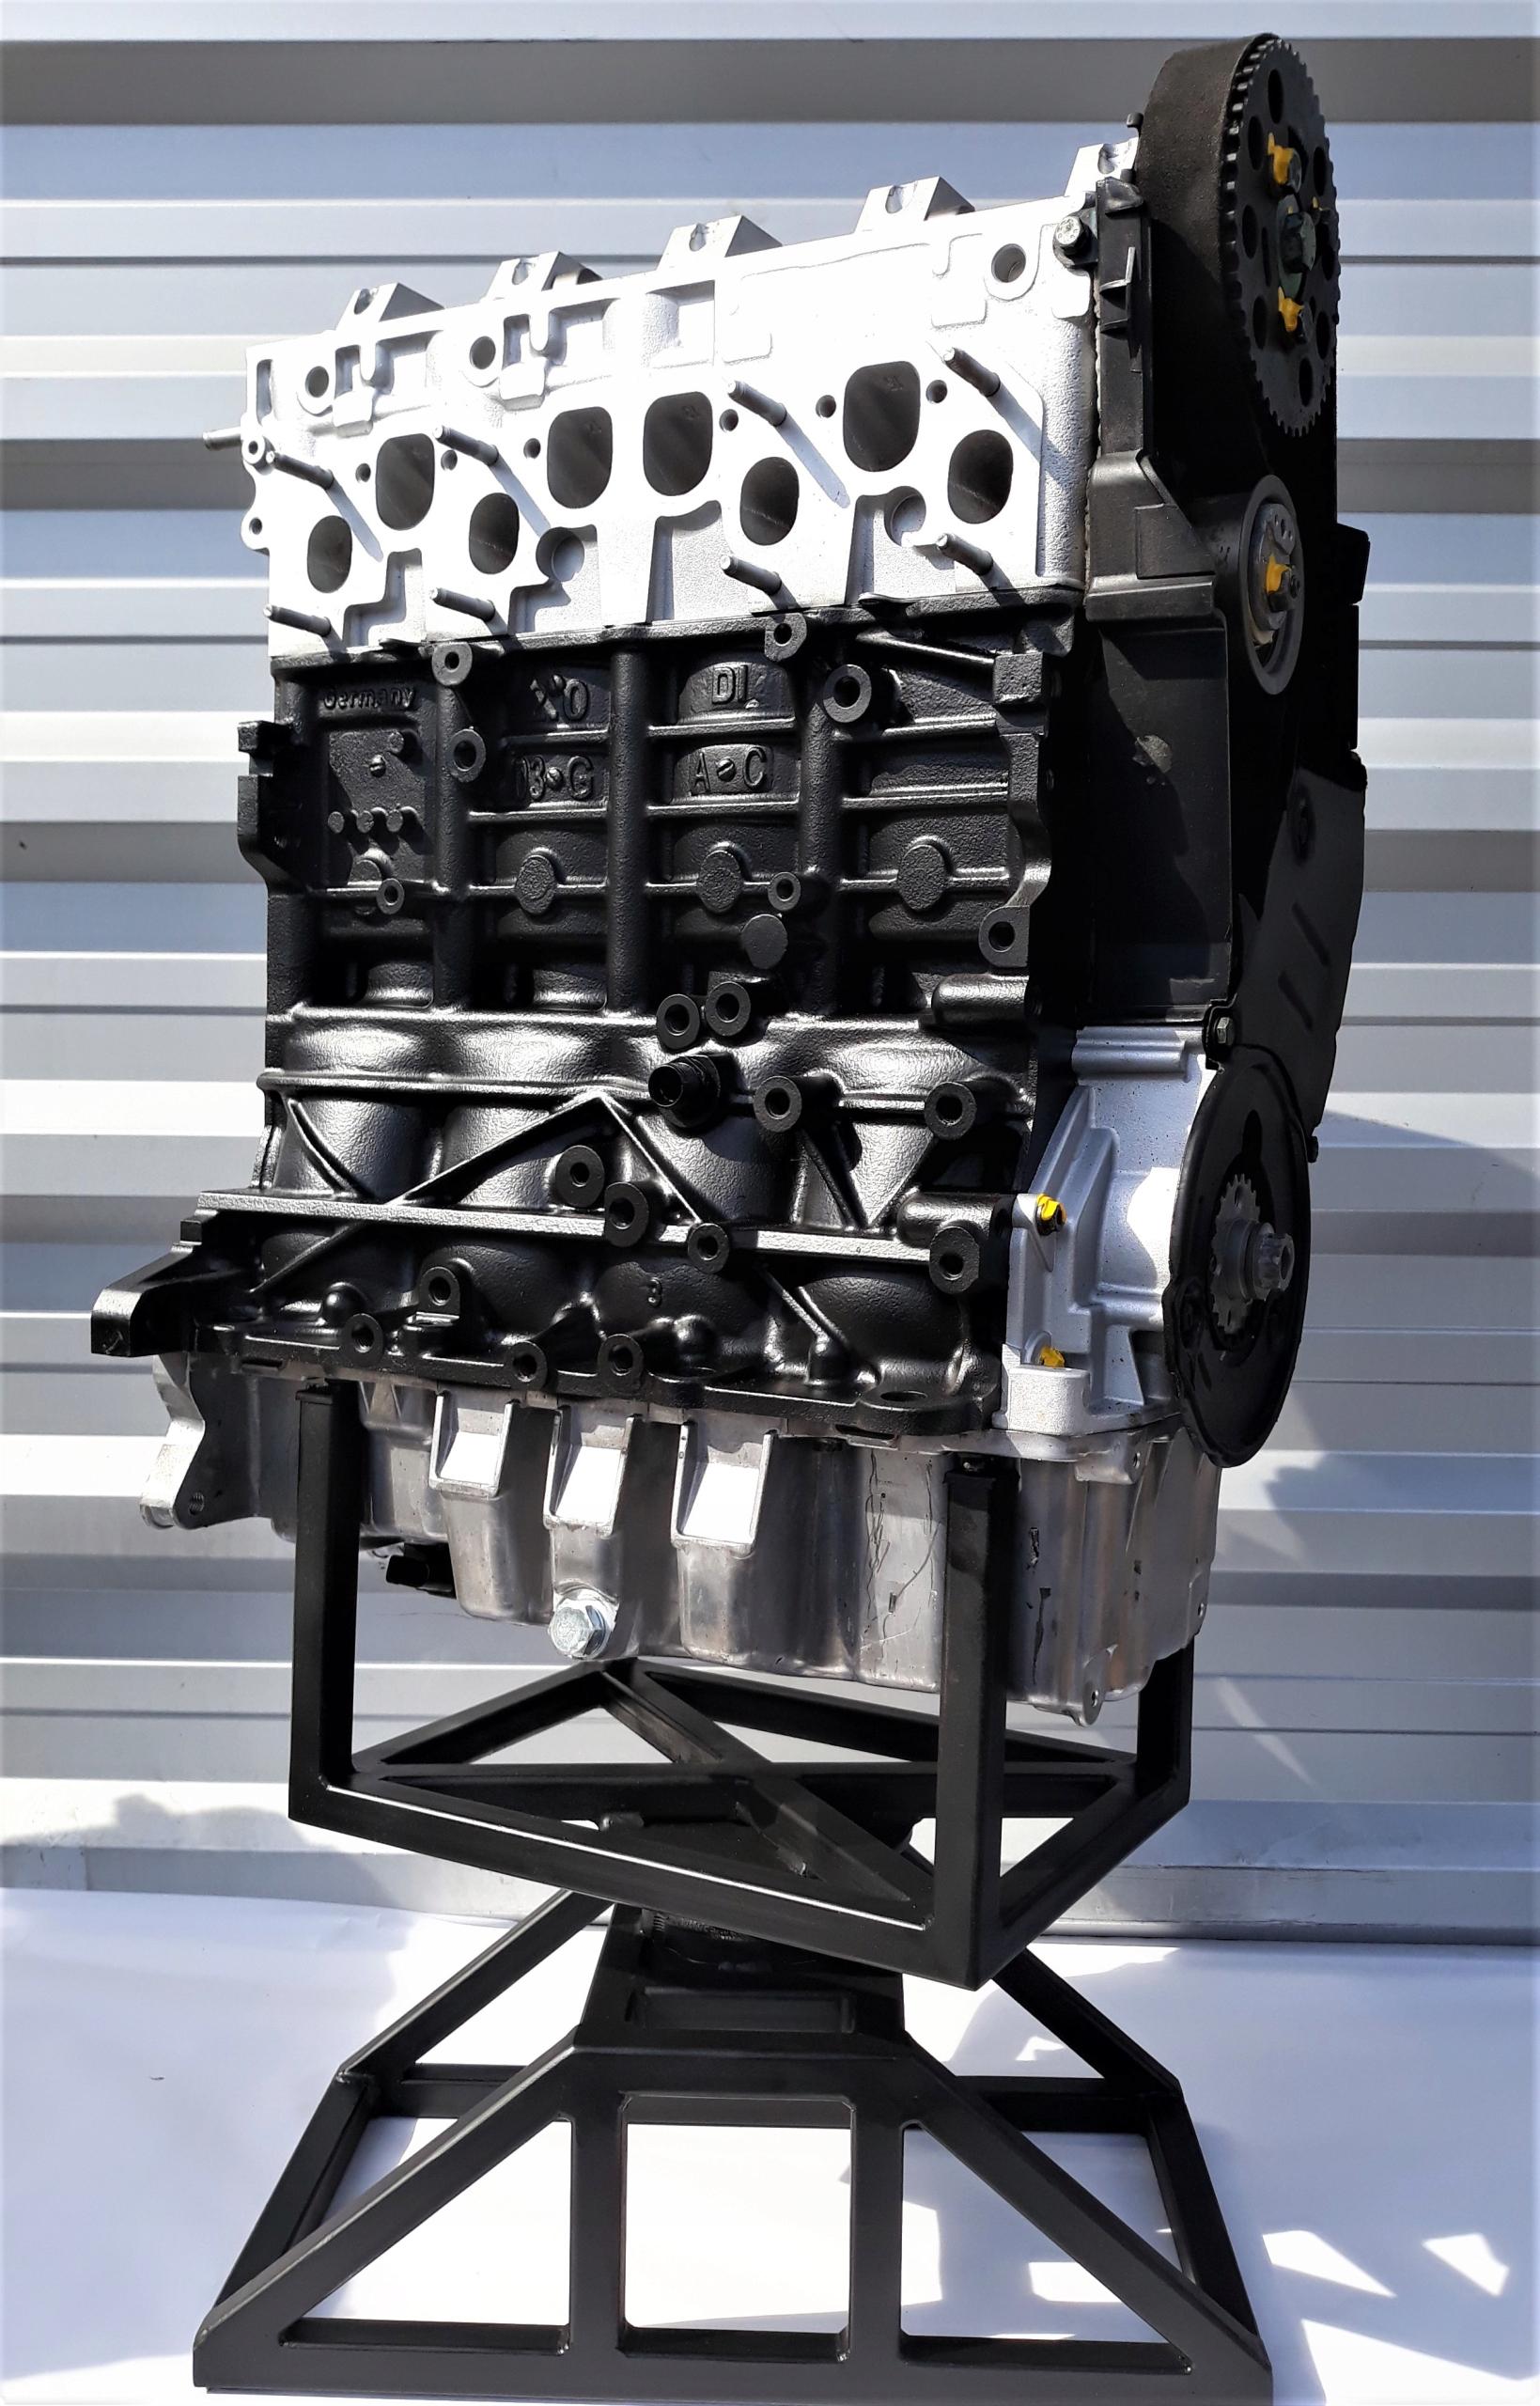 Двигатель BRT 8V 2.0 140KM VW SHARAN SEAT ALHAMBRA